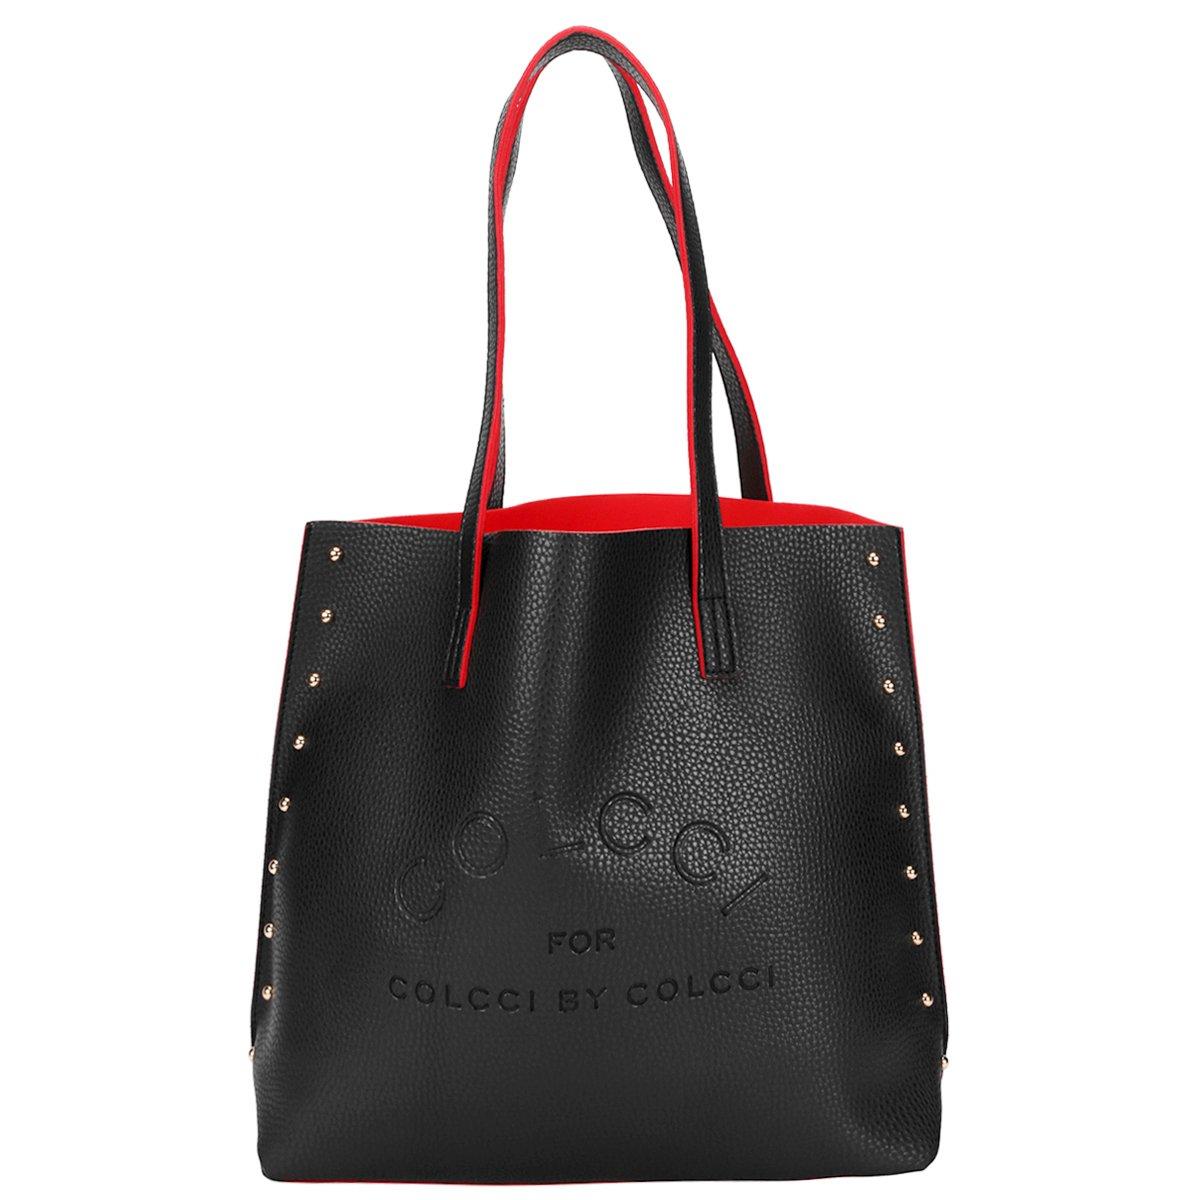 b8ecce2b30c99 Bolsa Colcci Shopping Bag Colcci by Colcci - Compre Agora   Netshoes